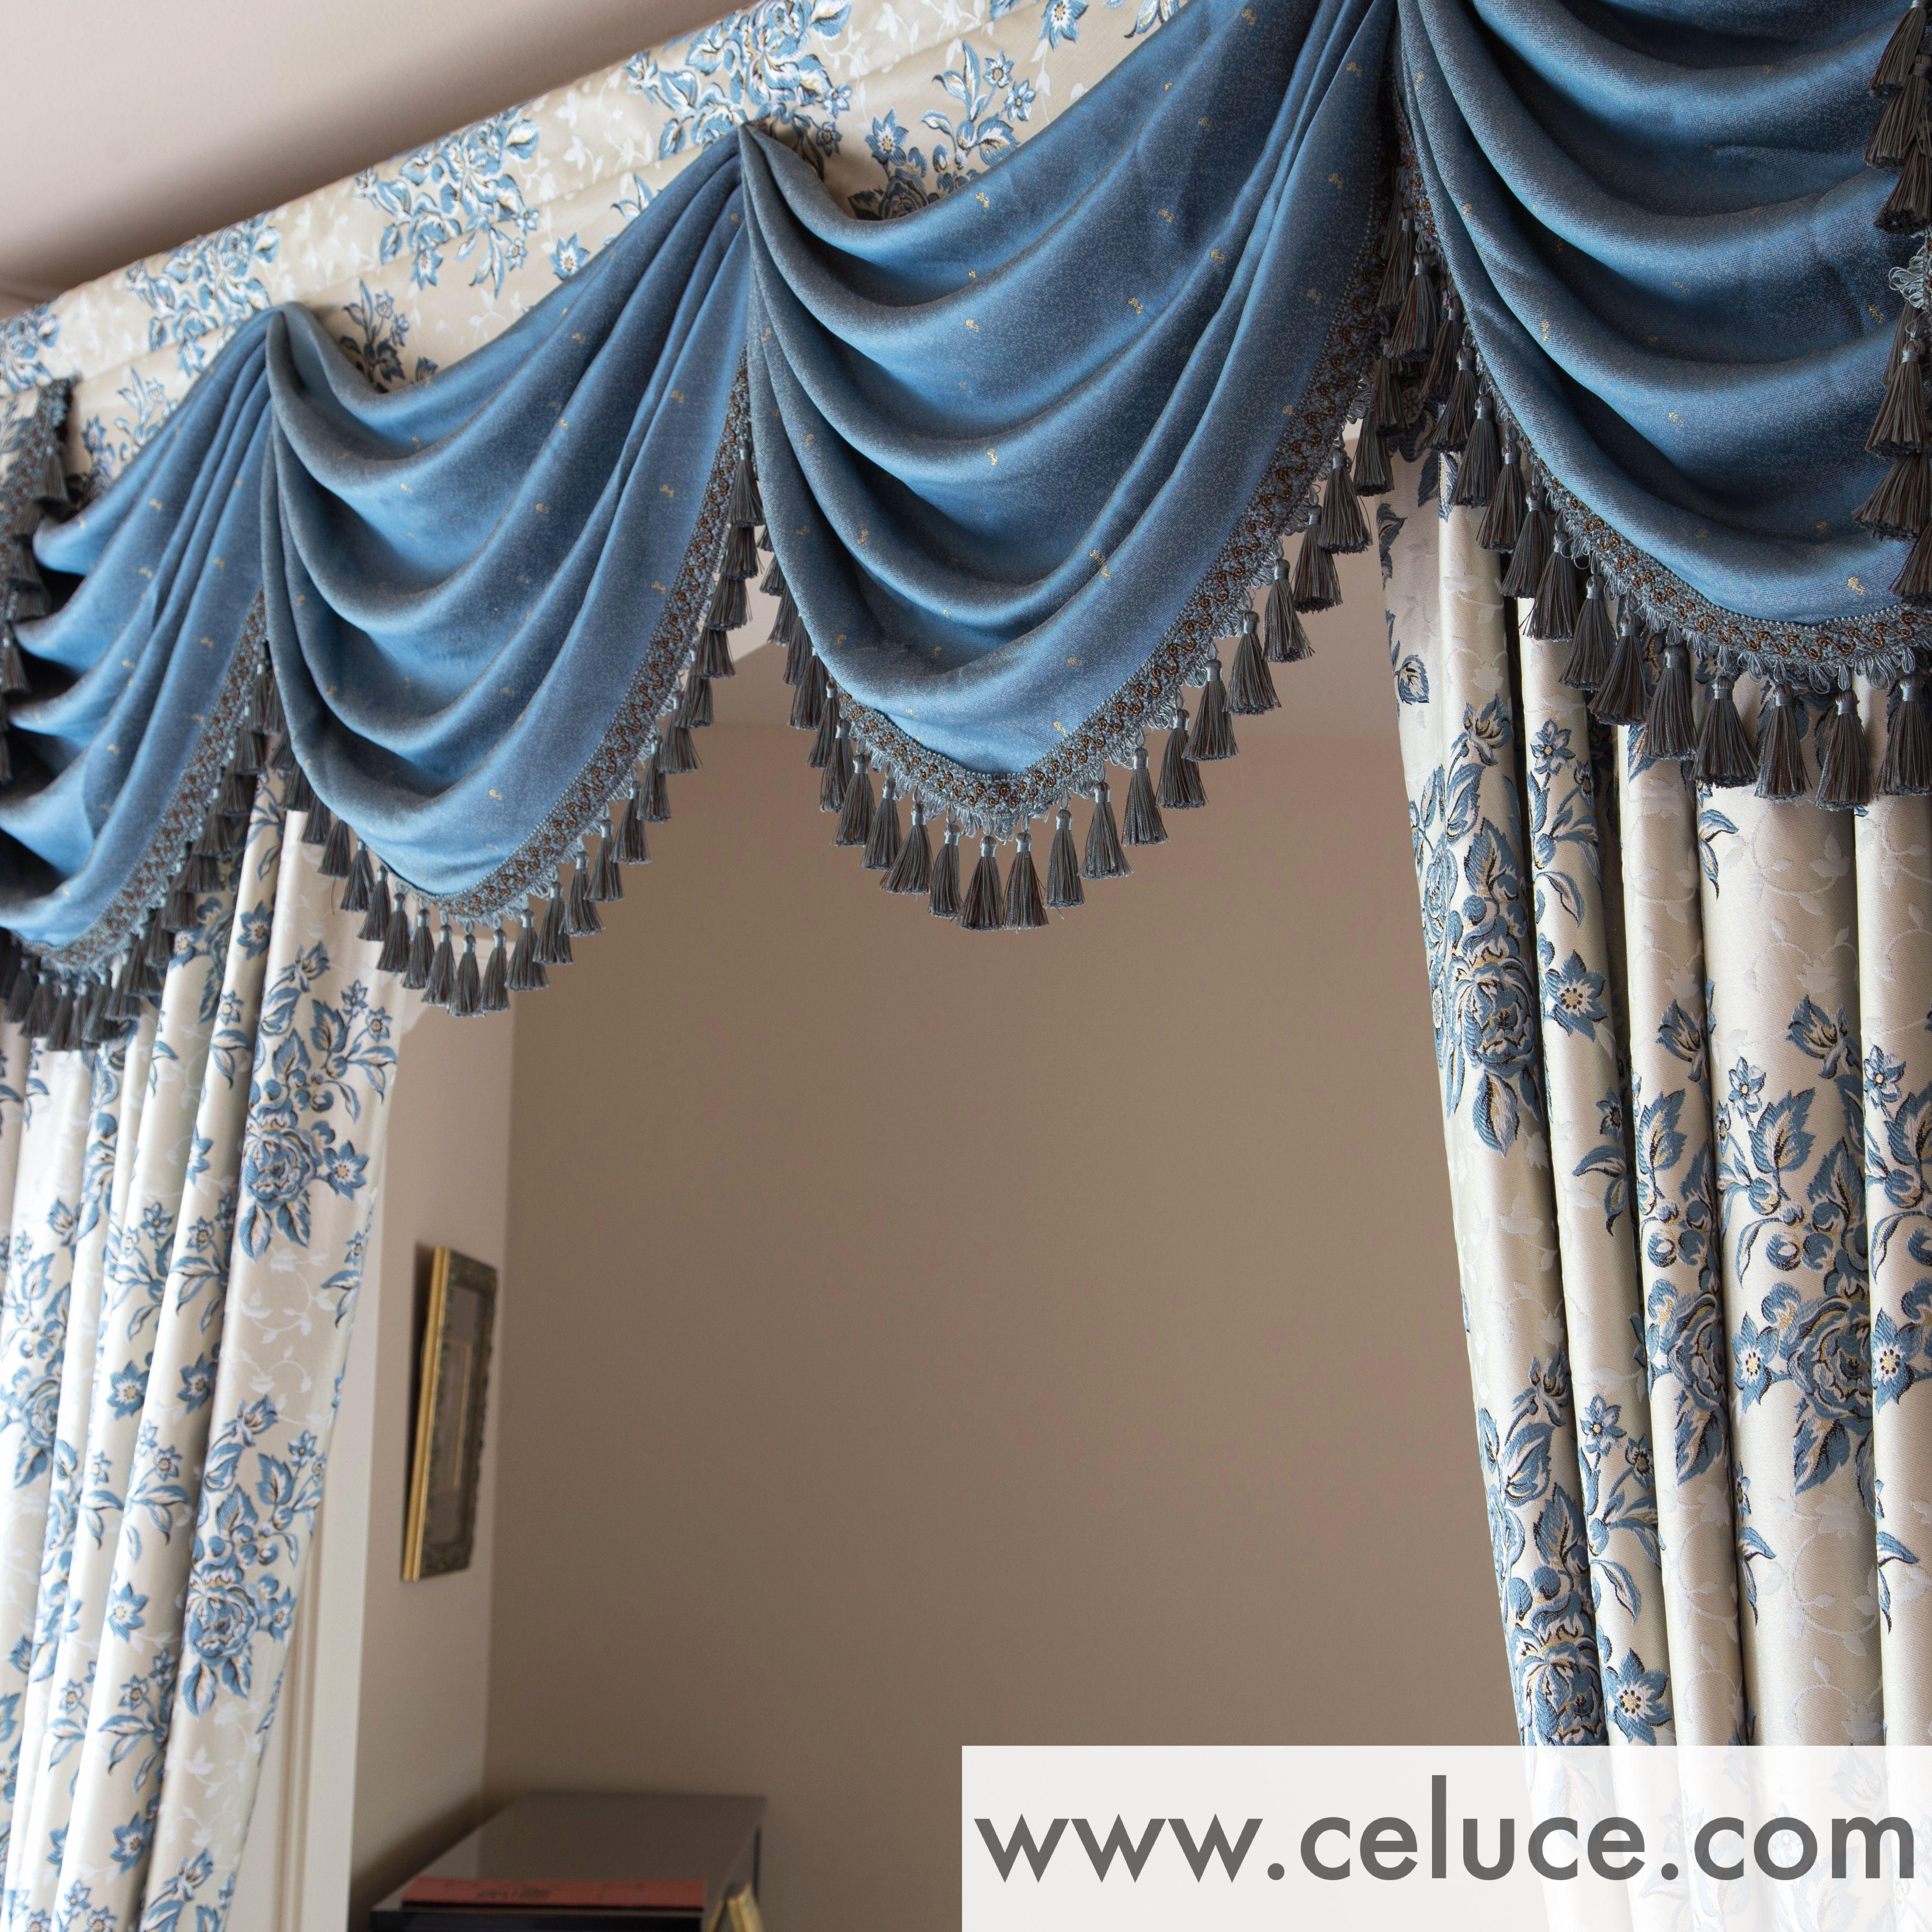 Www Celuce Com Customize Curtains Online Swag Valance Victorian Style Curtains Elegant Curtains Unique Curtains